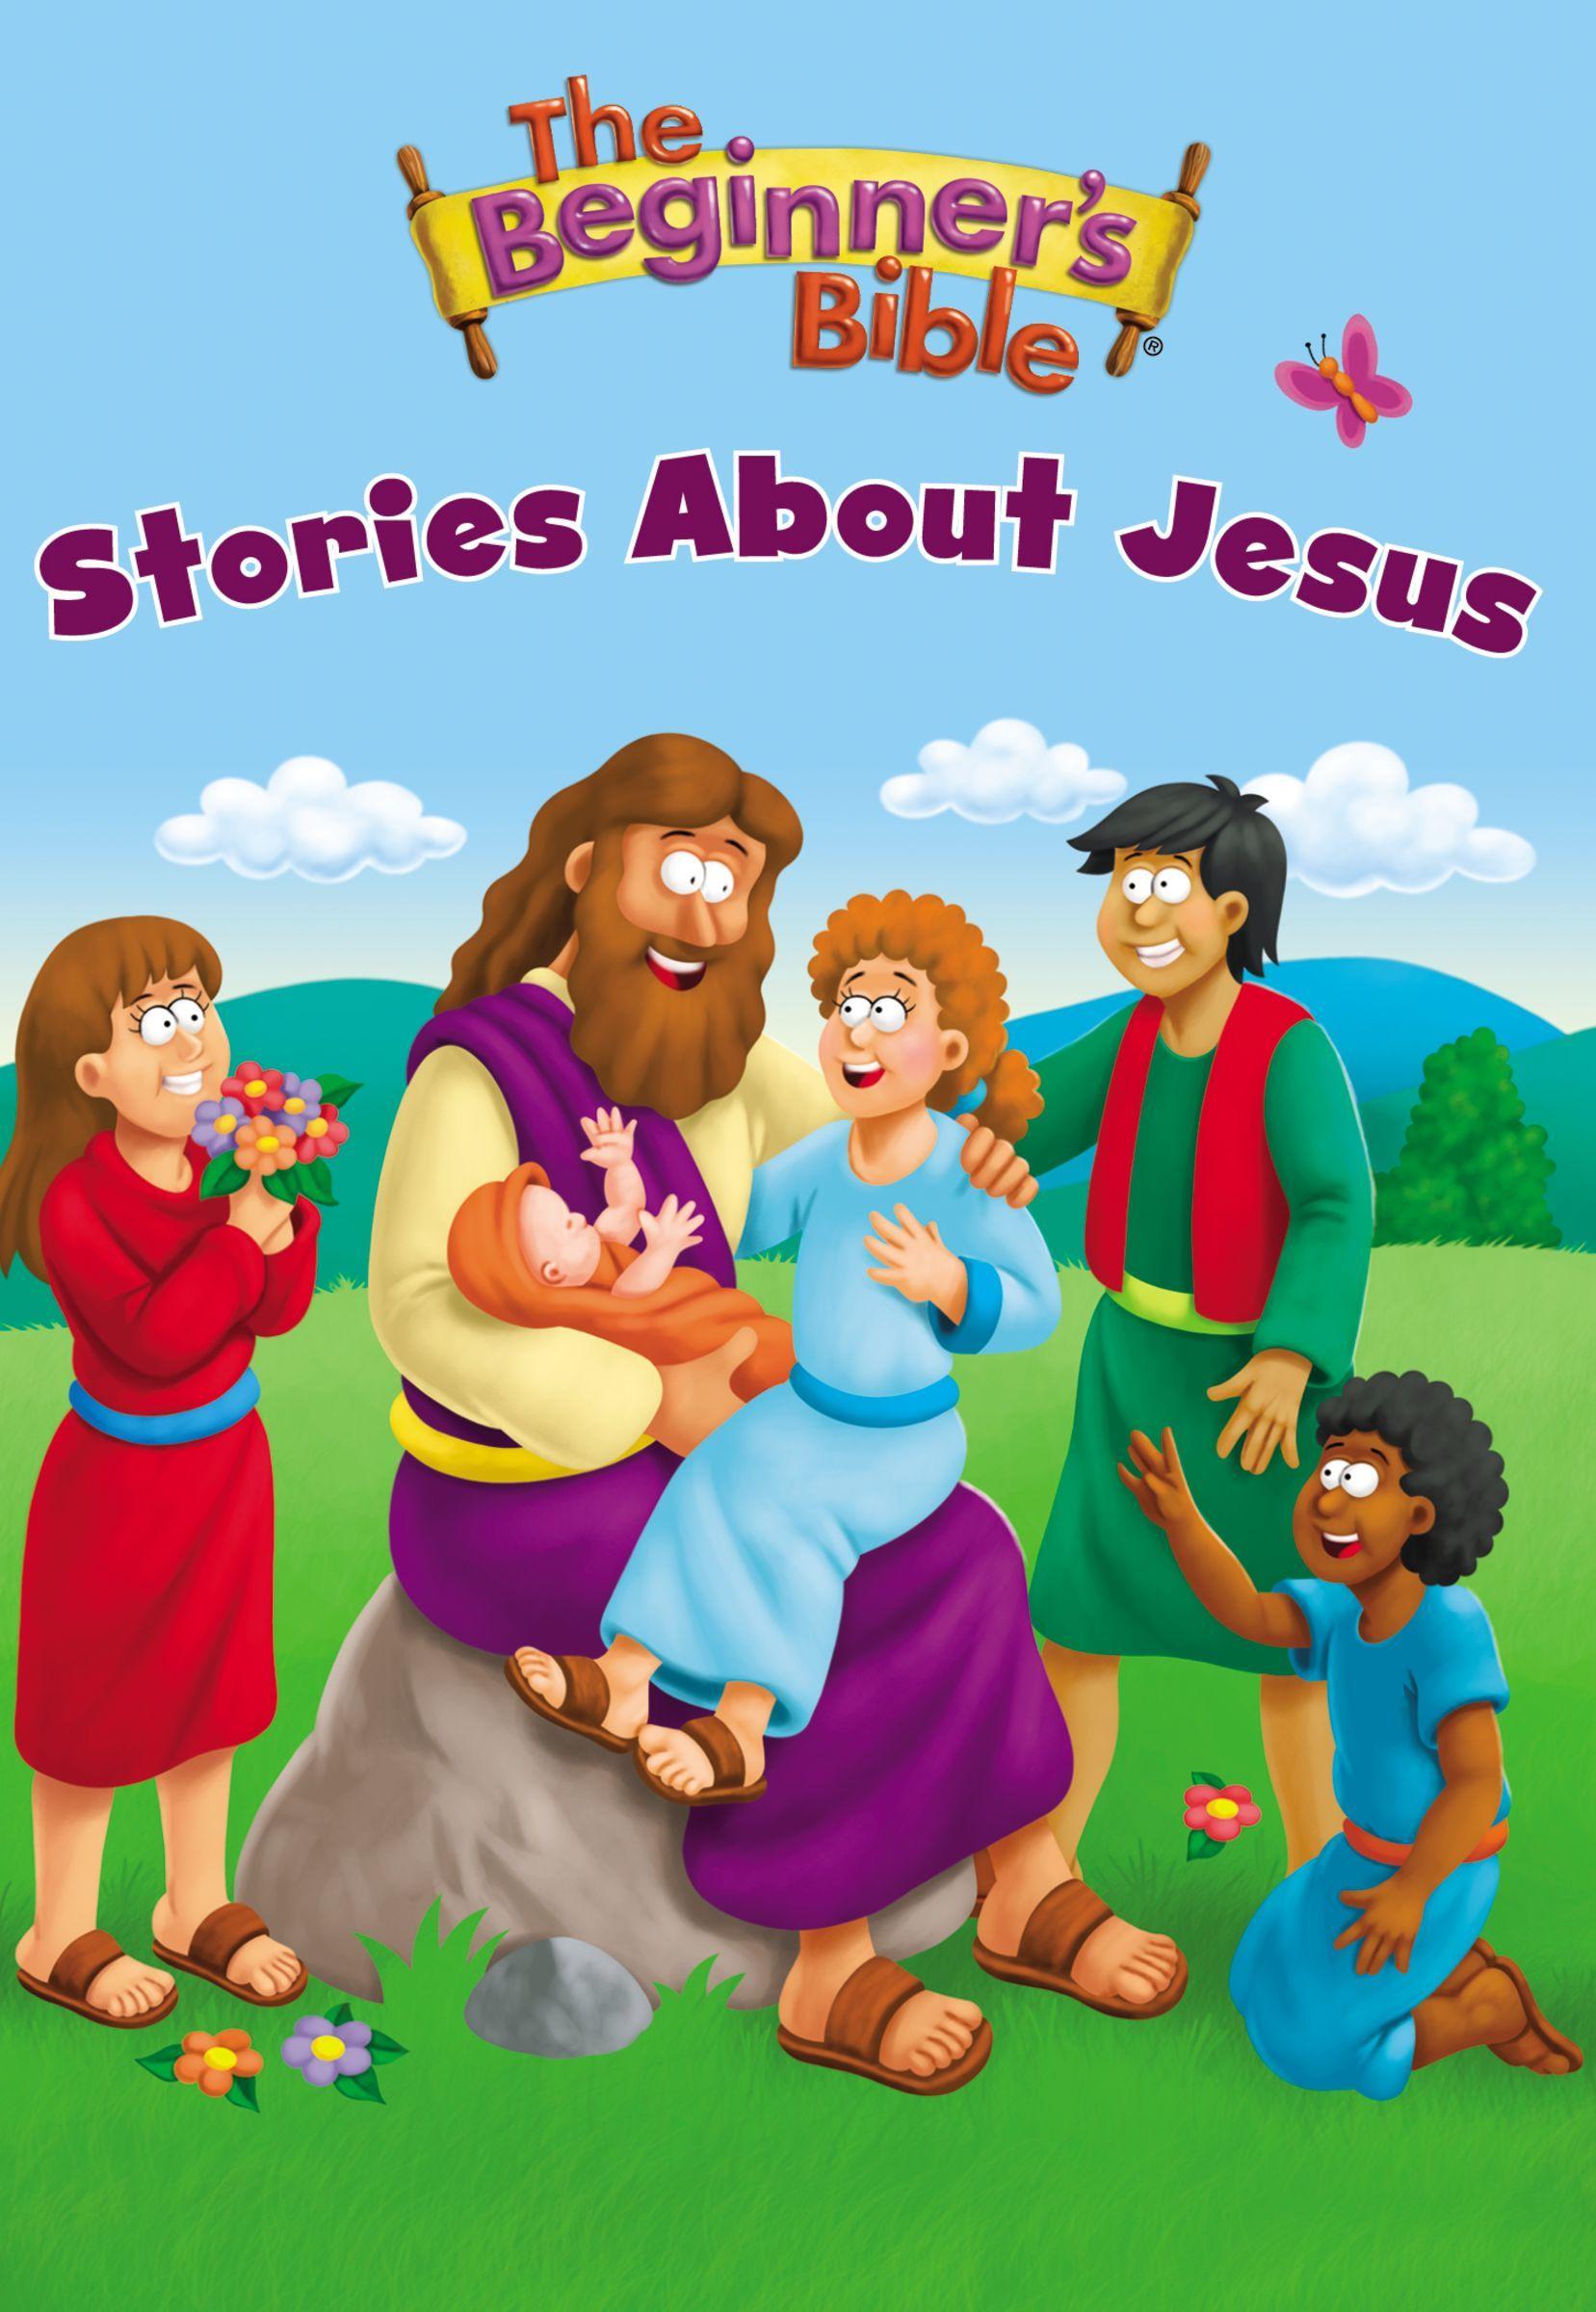 Beginner's Bible Stories About Jesus